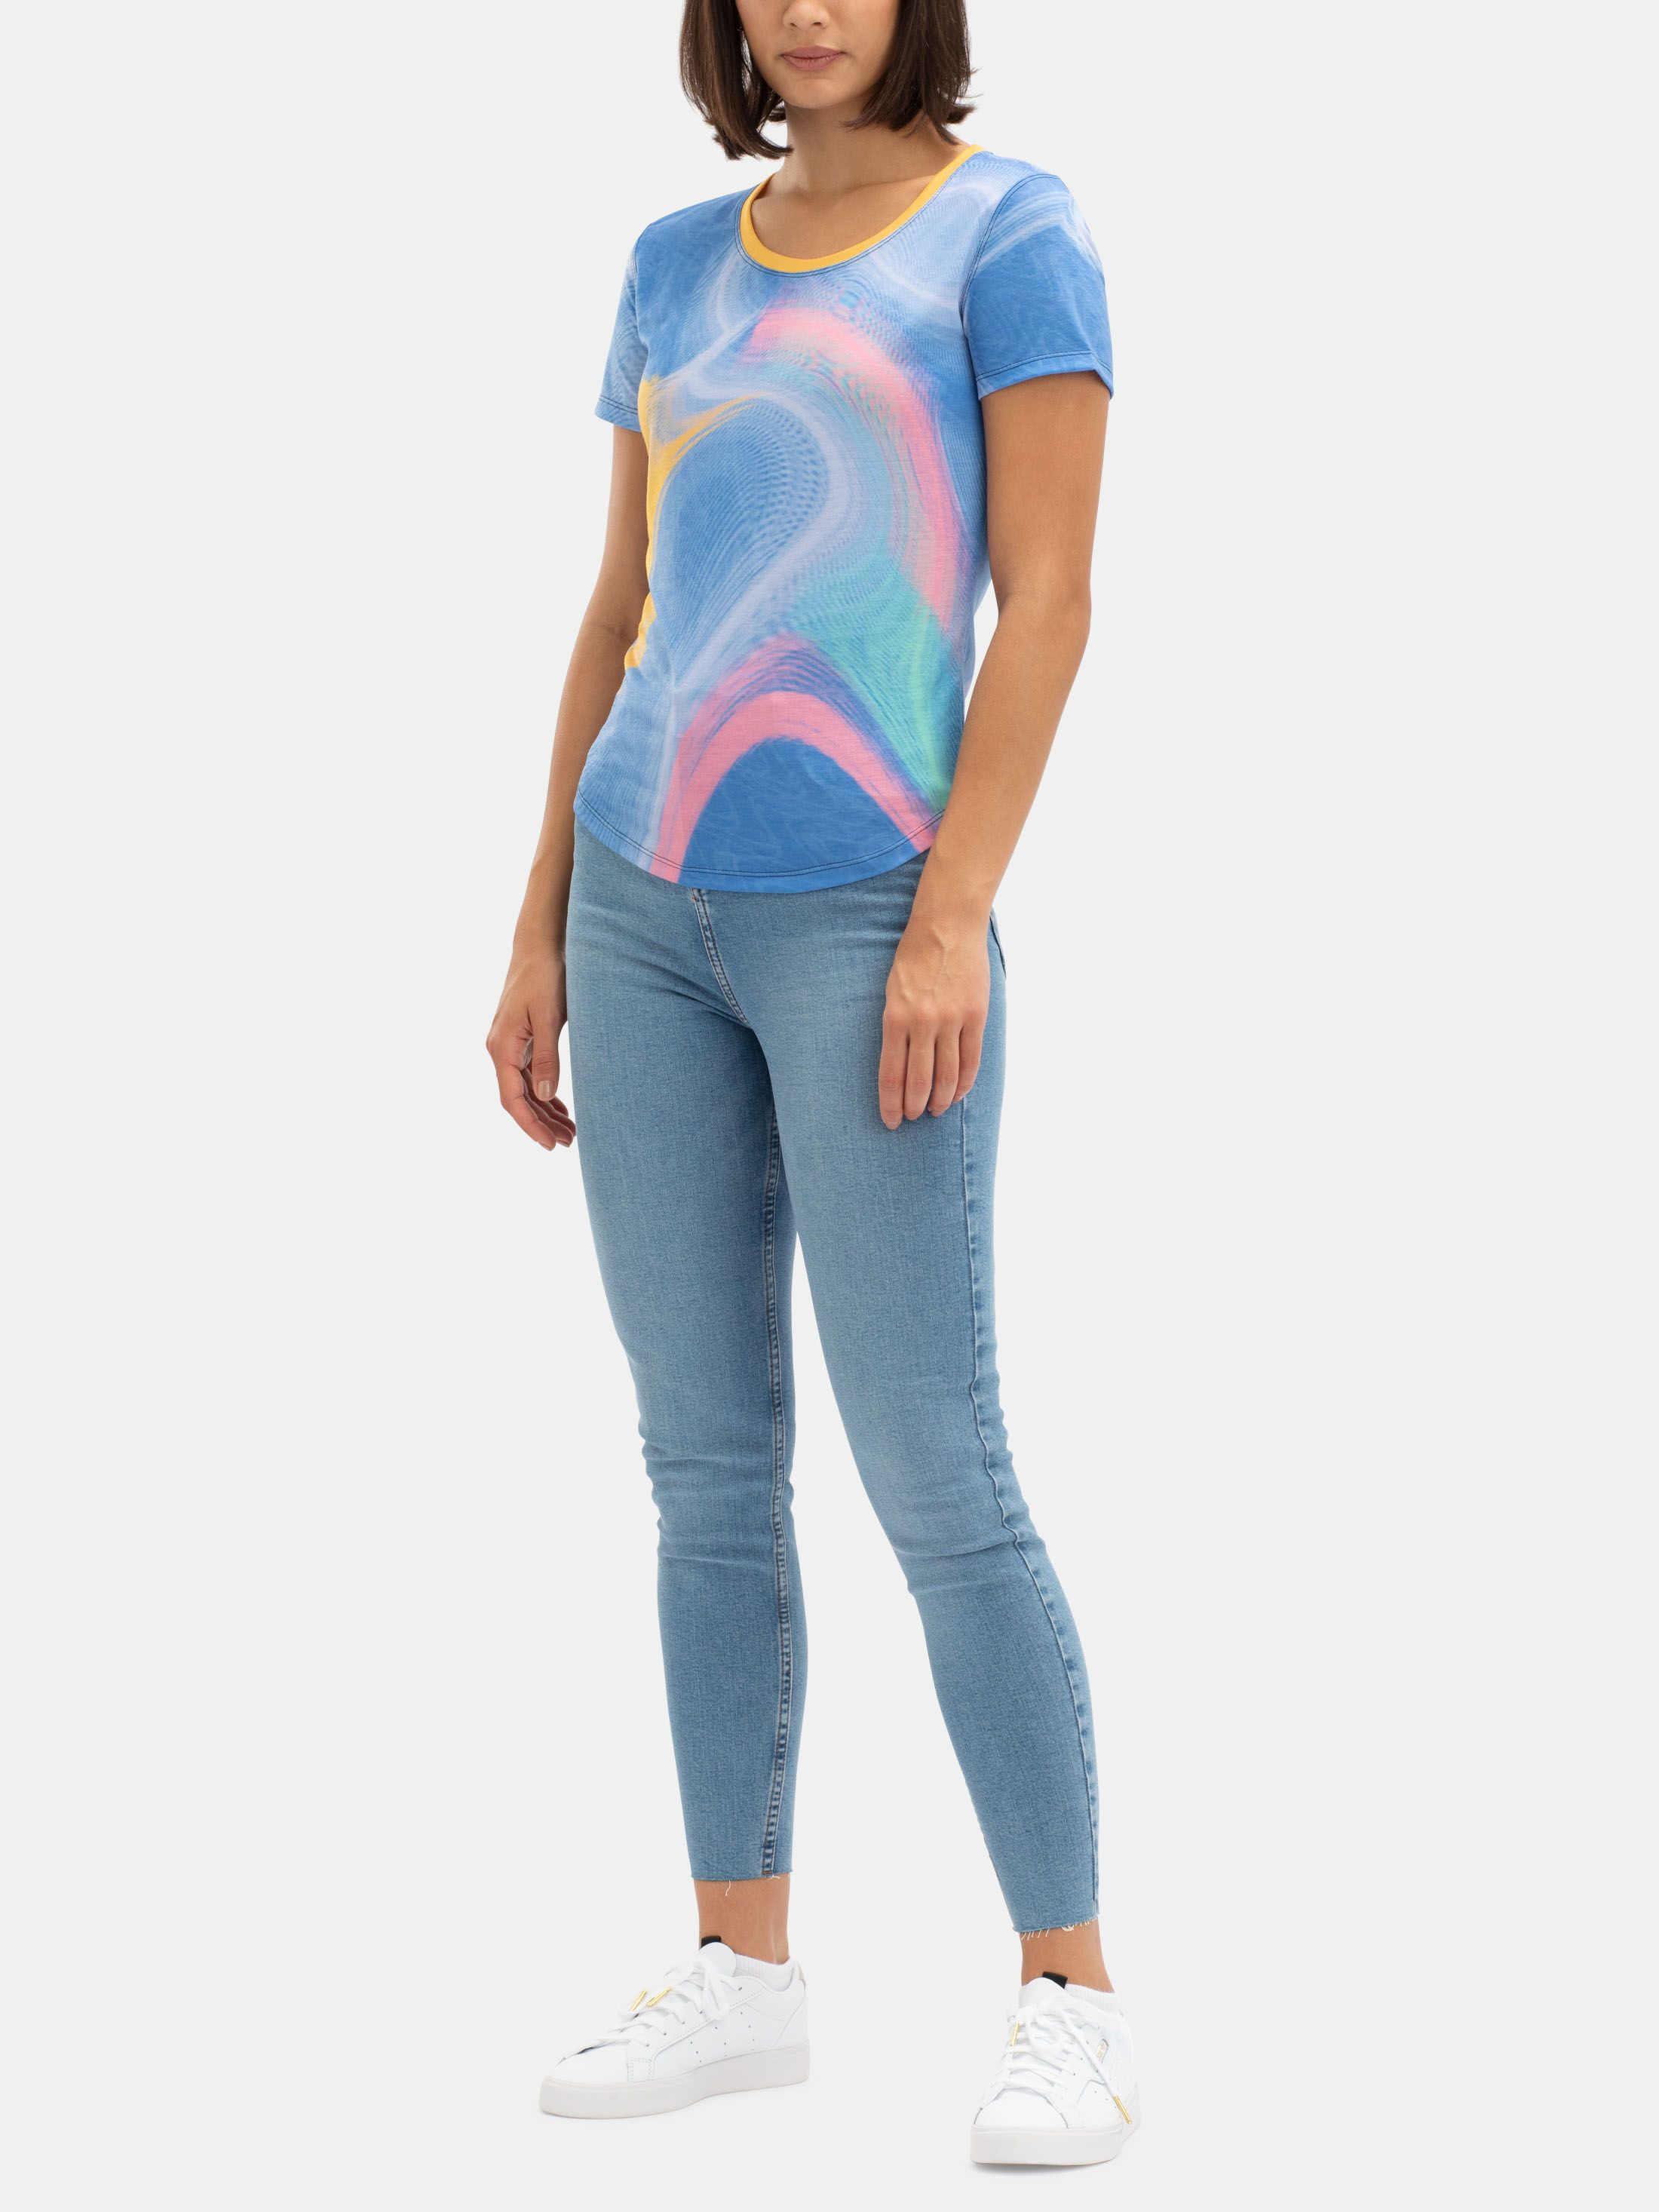 create your own premium cotton t shirt